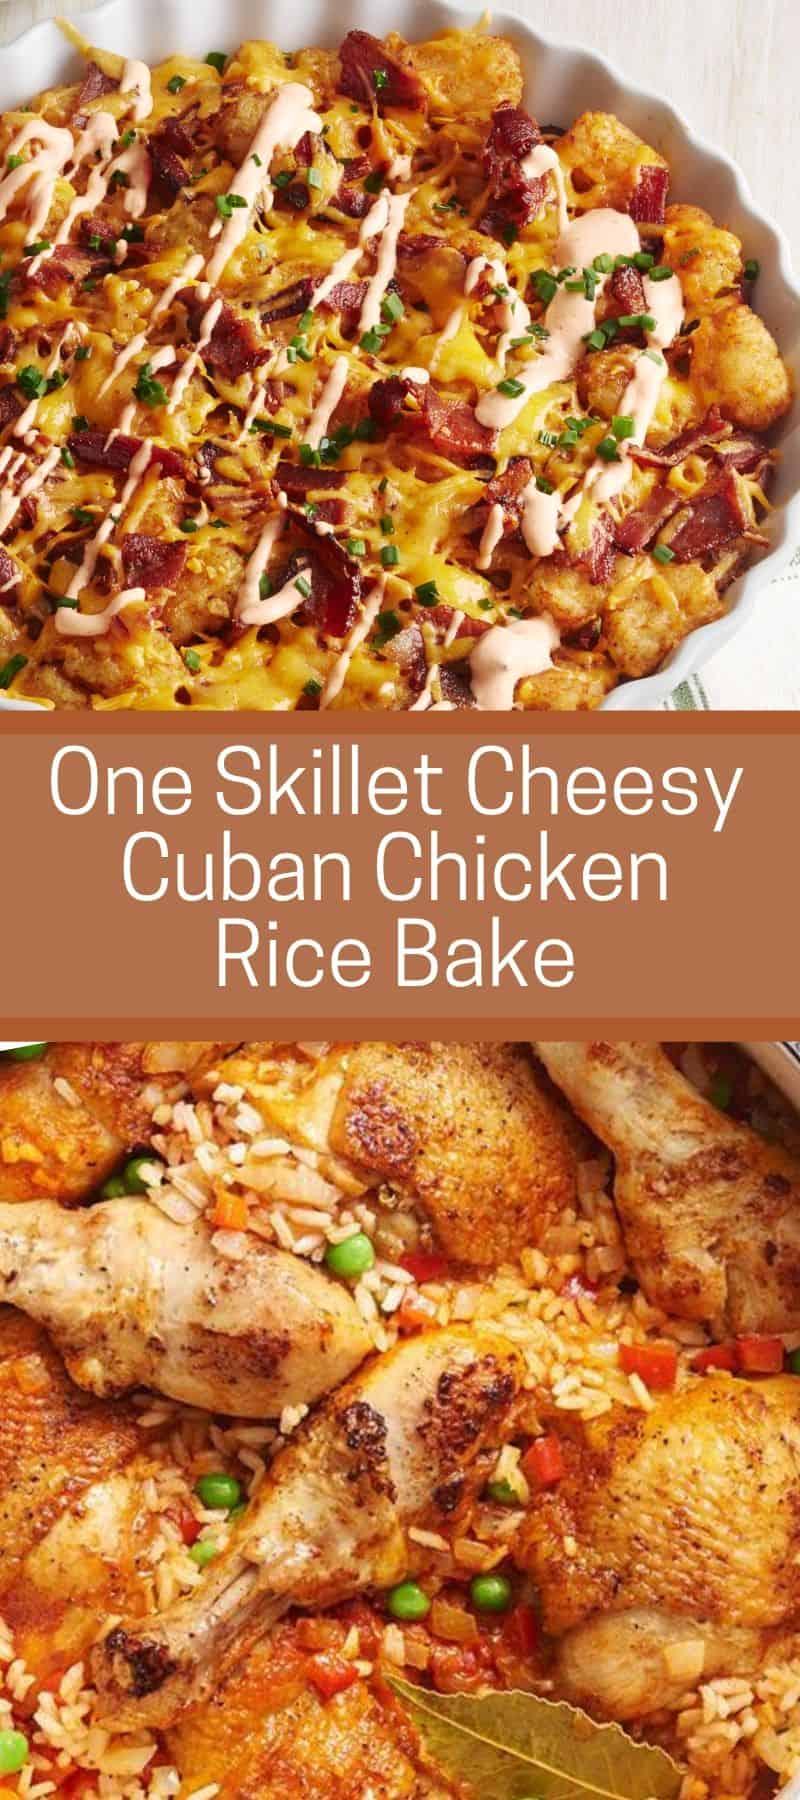 One Skillet Cheesy Cuban Chicken Rice Bake 3